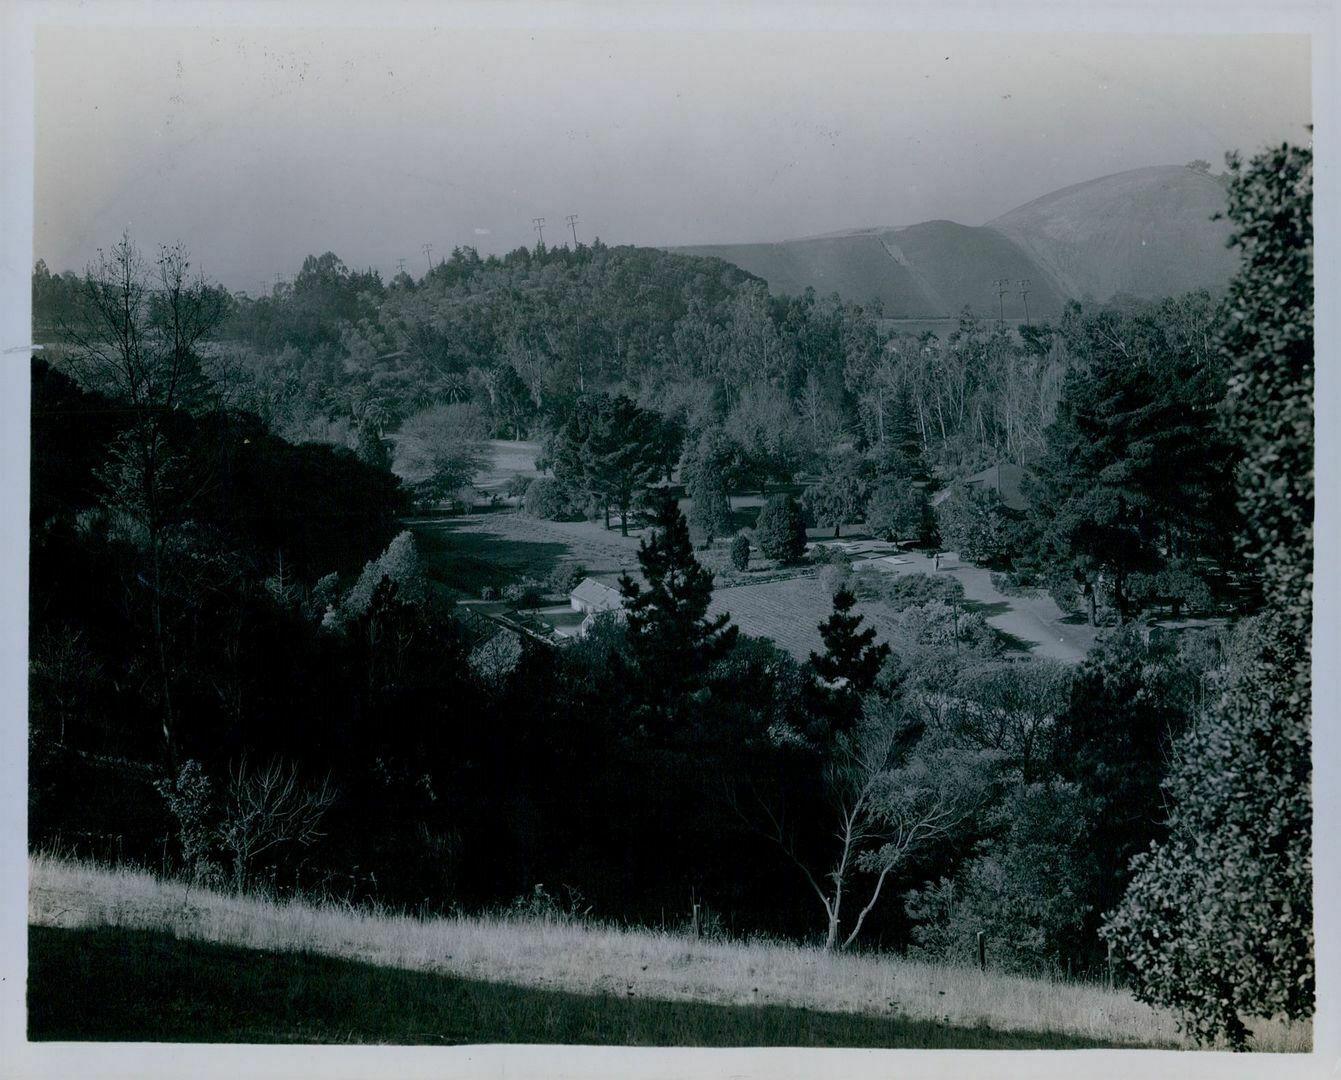 Durant Park Talbot estate